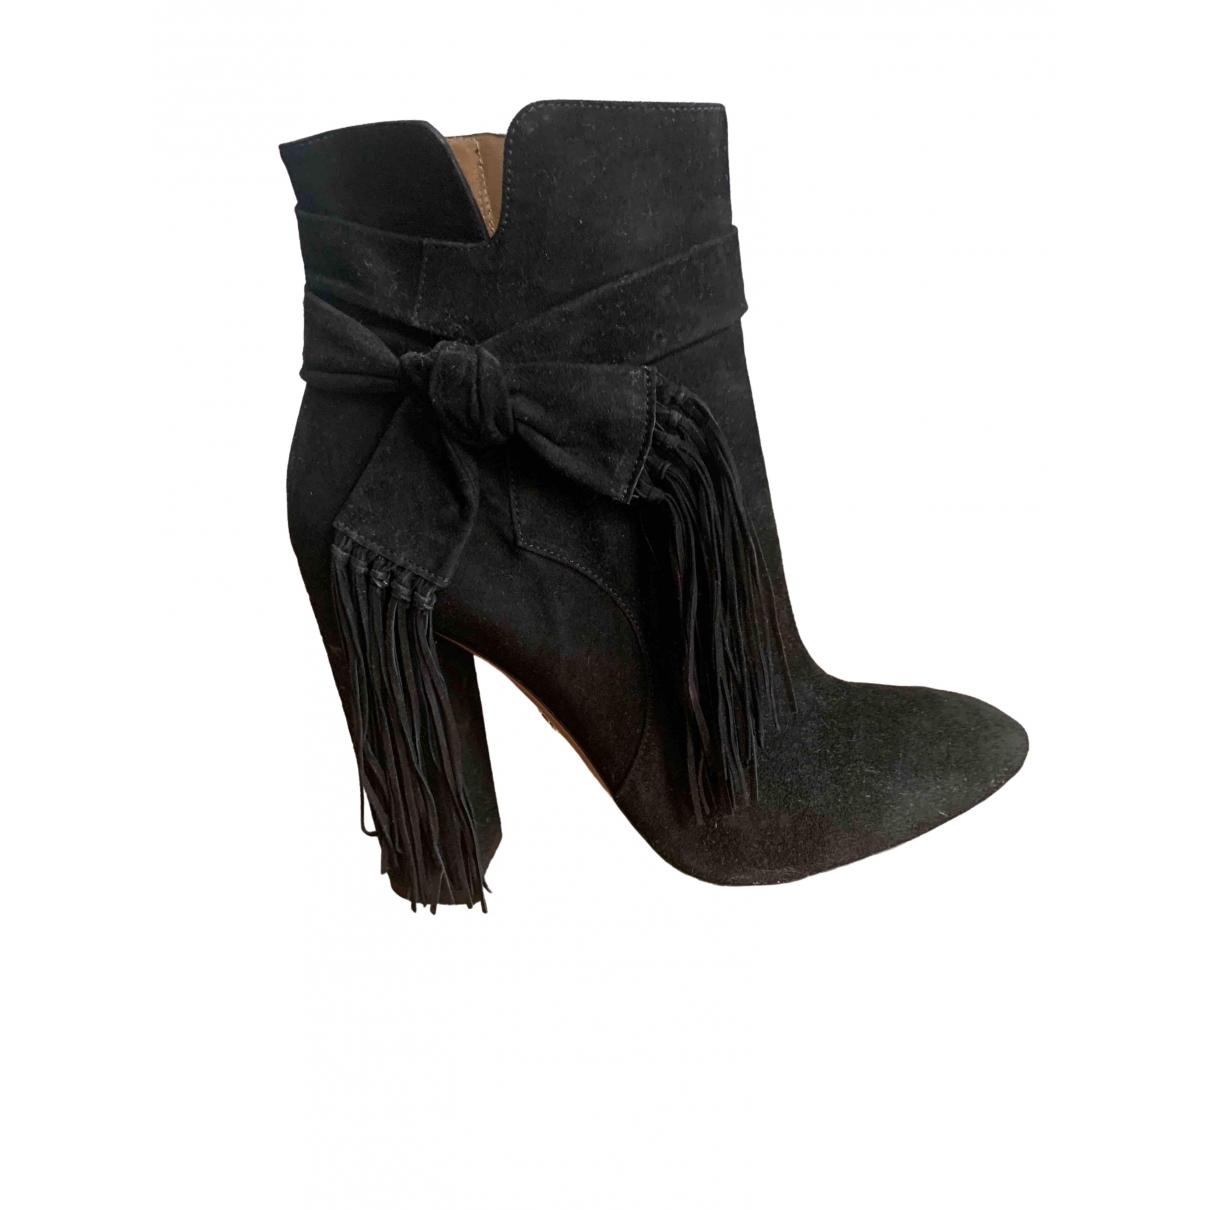 Aquazzura \N Black Suede Ankle boots for Women 40 EU